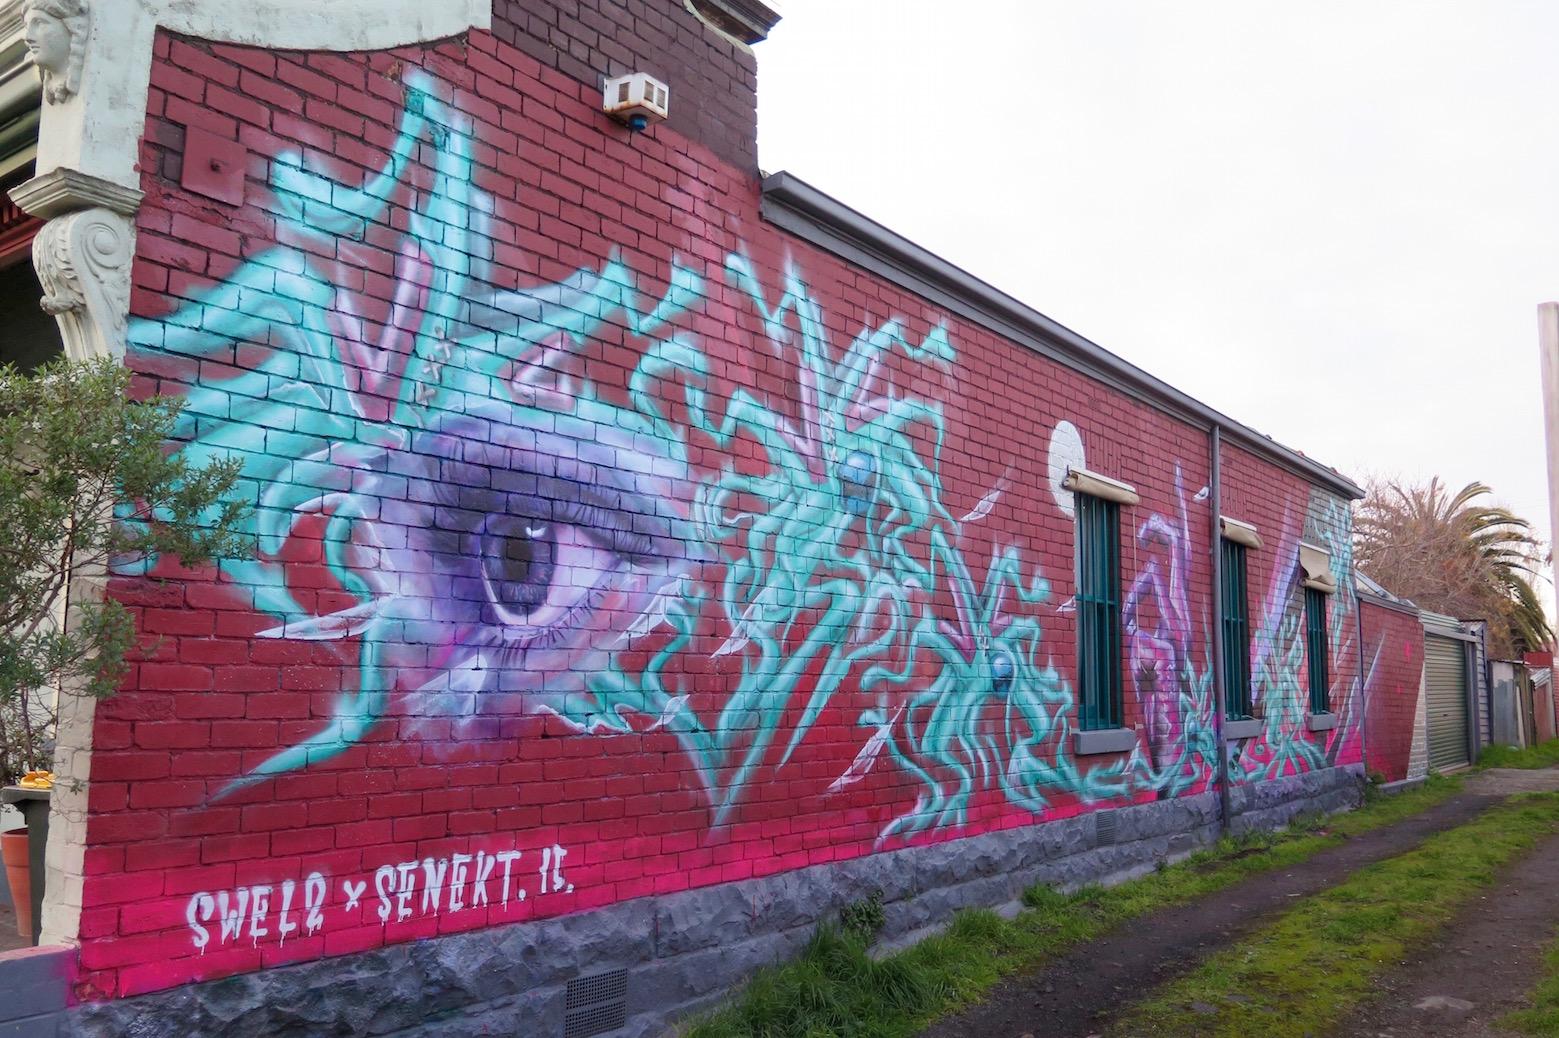 deansunshine_landofsunshine_melbourne_streetart_graffiti_invurt top ten 53 3 Senekt Swel2 Brunswick